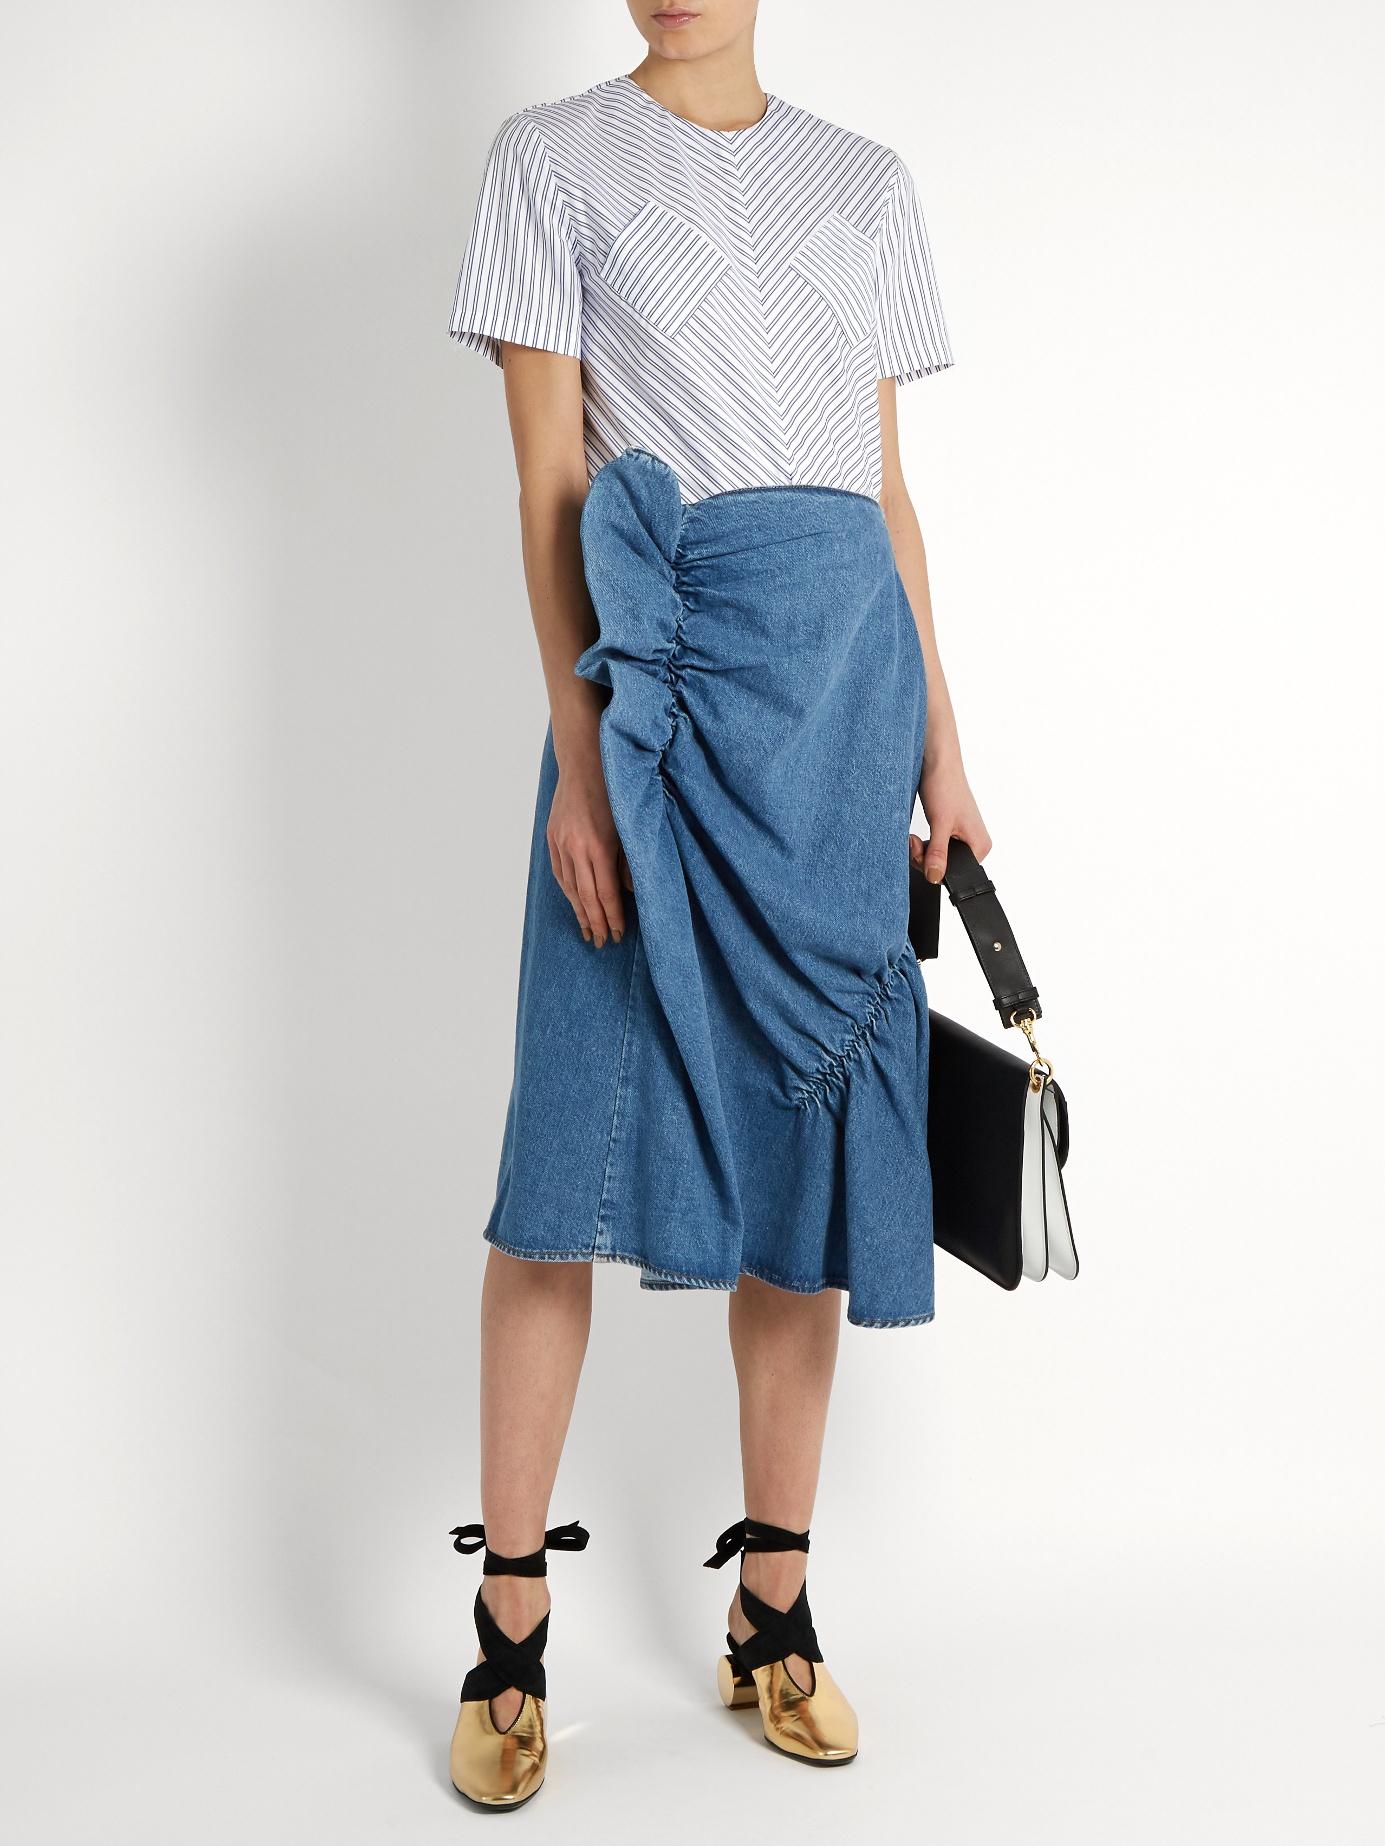 68f5e7e875 Zara Denim Skirt With Red Pockets – DACC